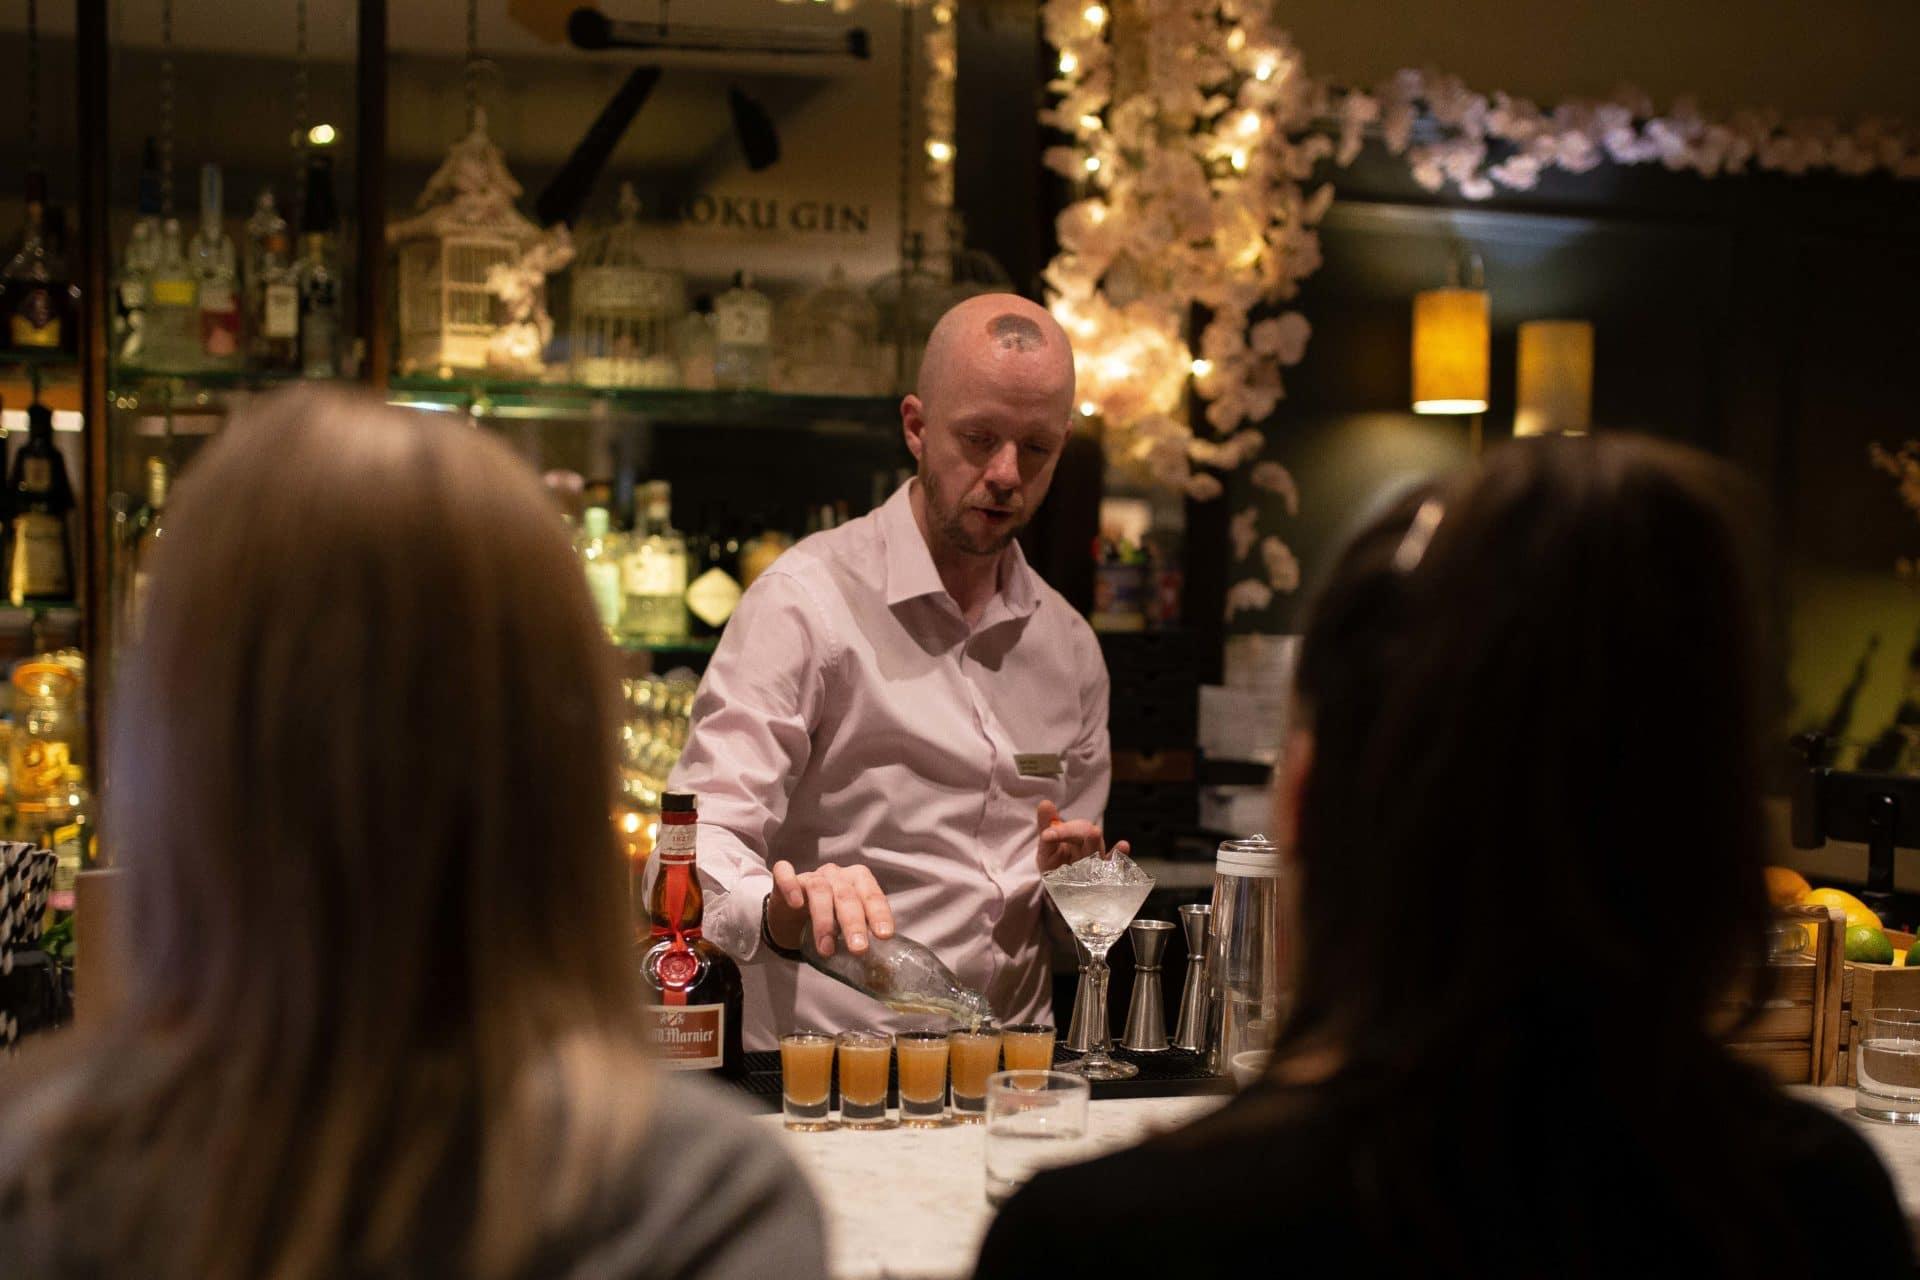 How to become a career bartender - Matt the career bartender